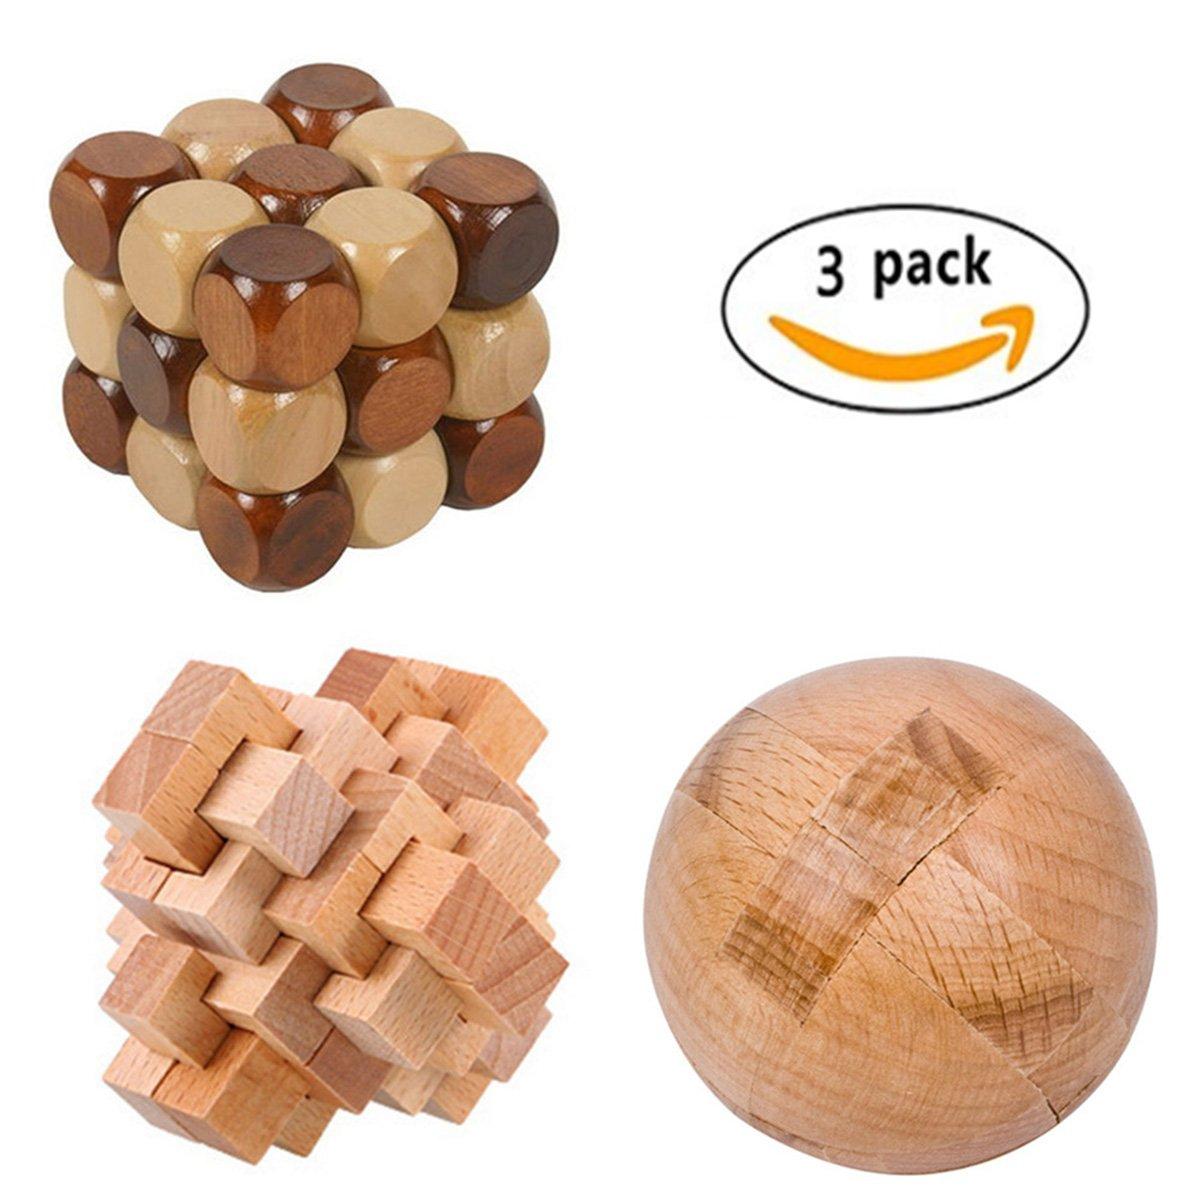 CiCy 3 Pcs 3D Wooden Cube Brain Teaser Puzzle Snake Cube Wooden Brain Teaser Puzzle Children Kids Educational toy Puzzles Magic Balls 24 Unlock Interlocking Brain Teaser Puzzle